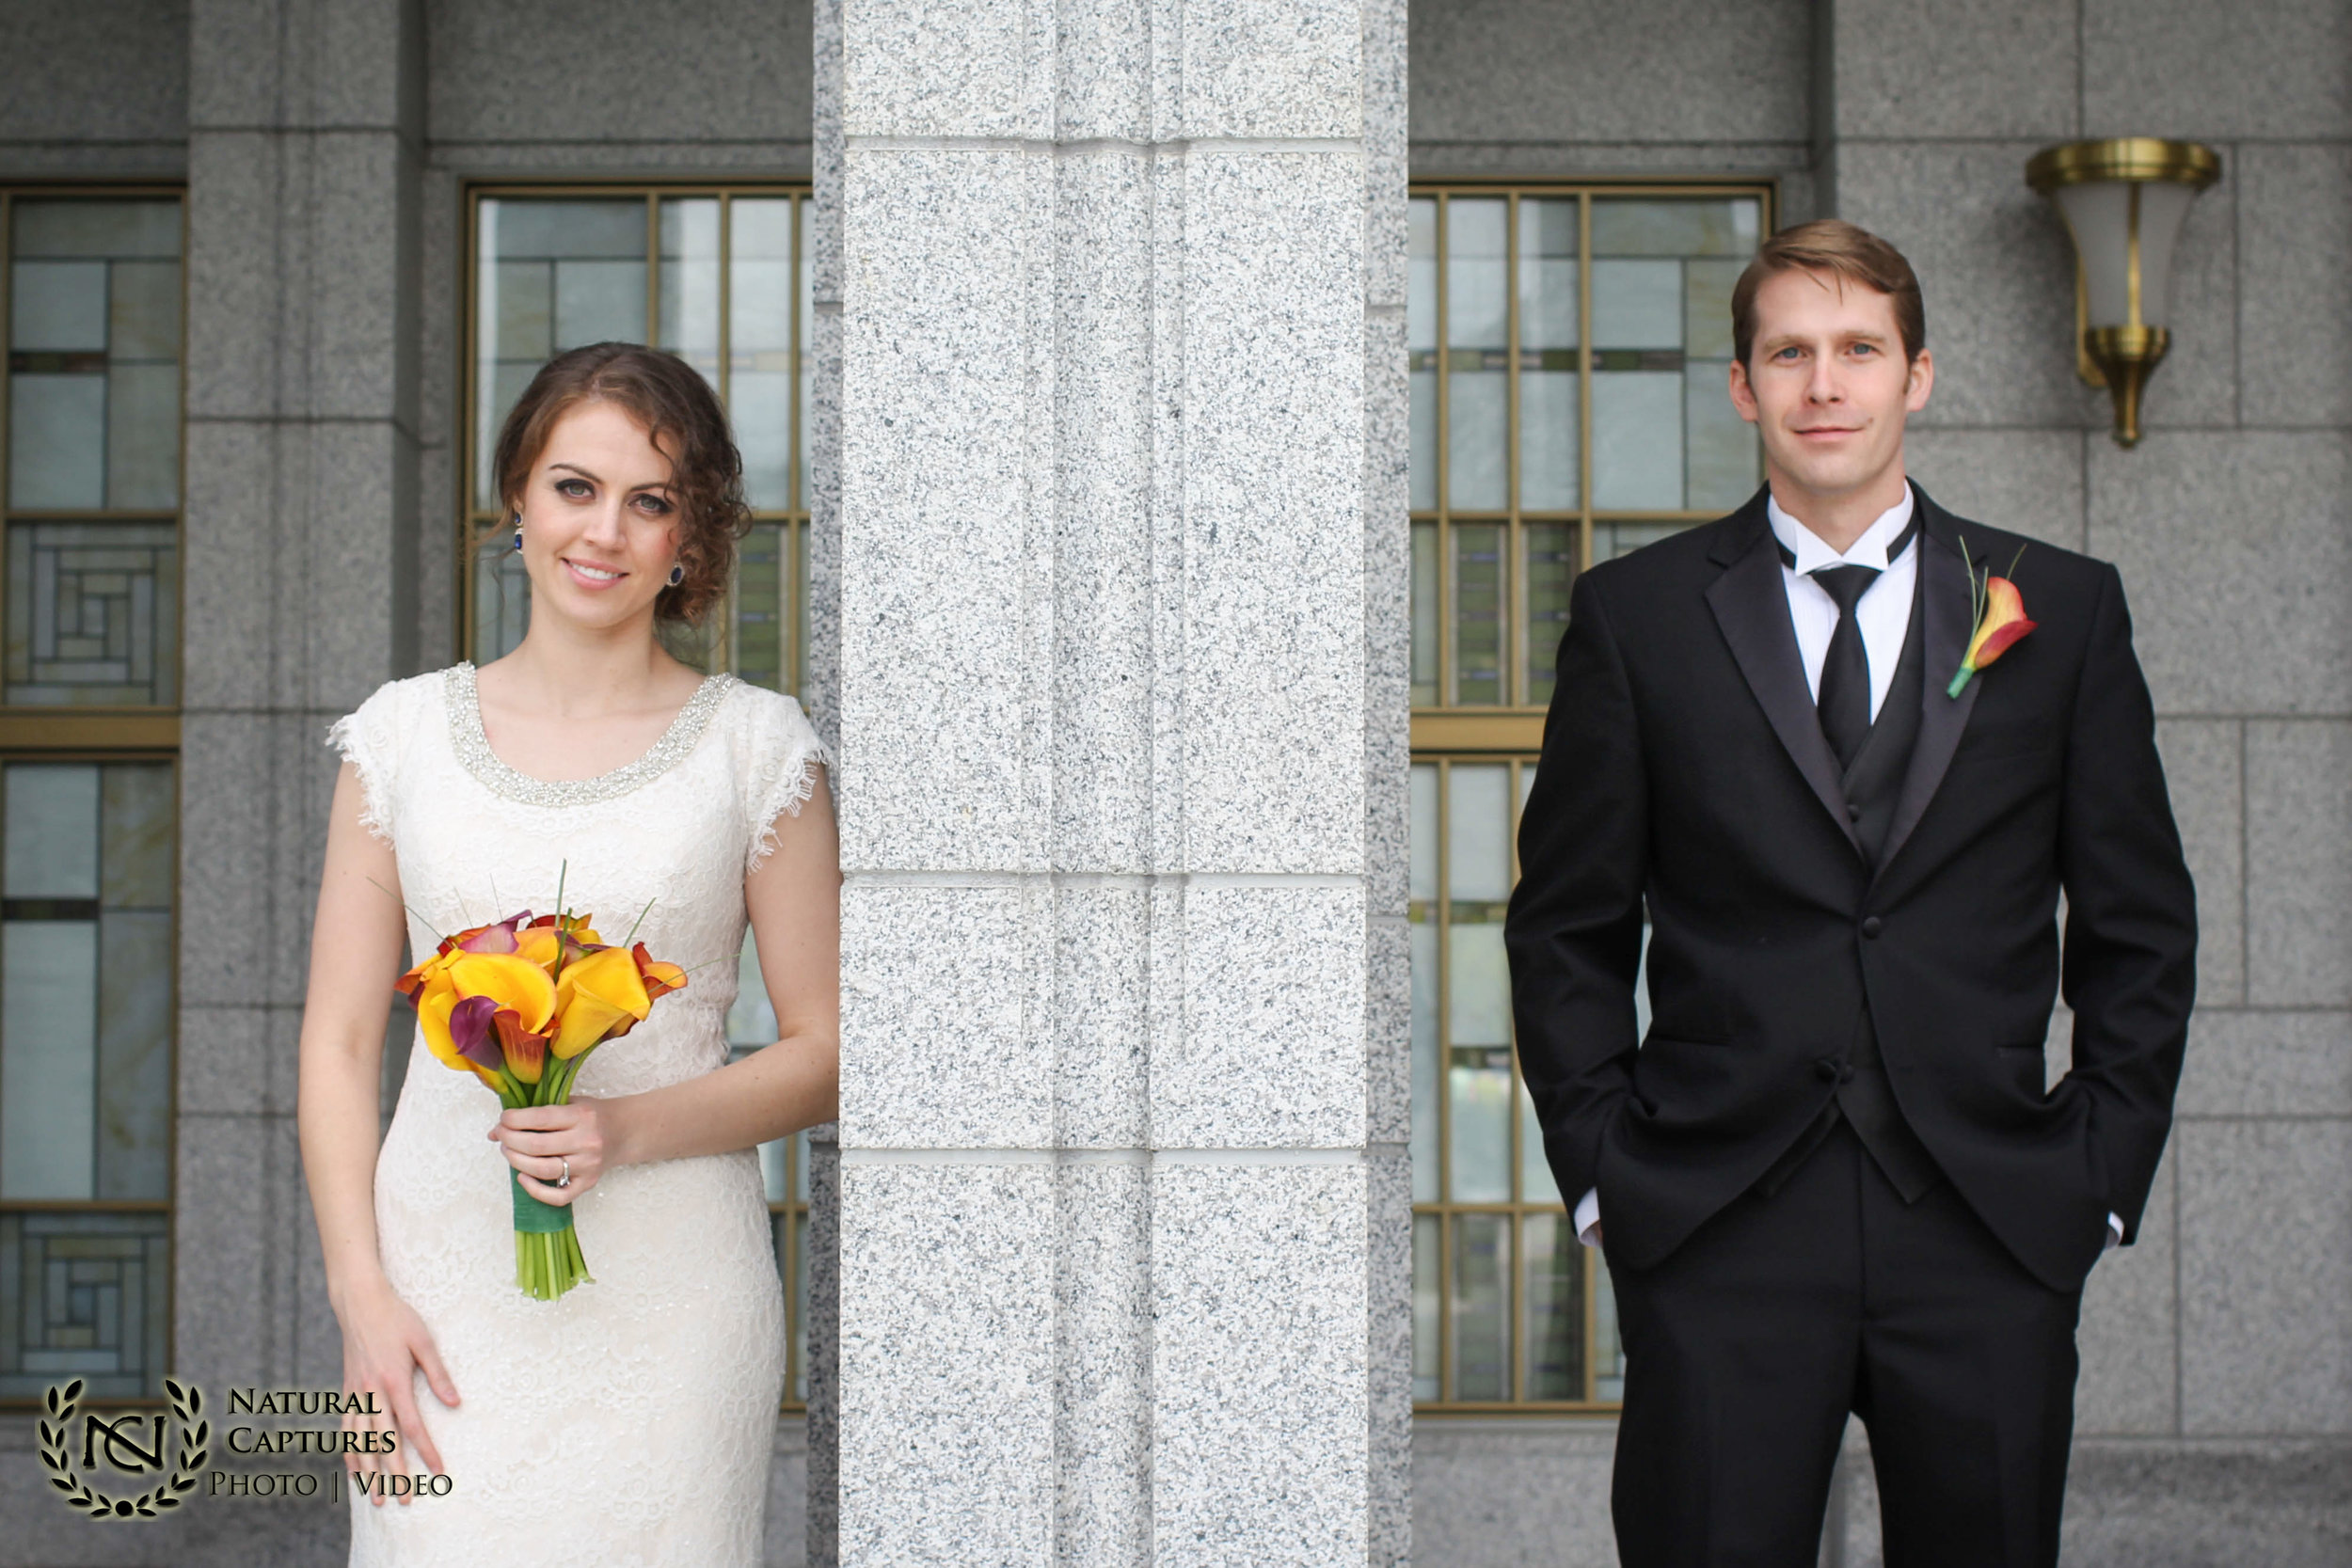 Draper Utah Temple Wedding Photography (10 of 12)